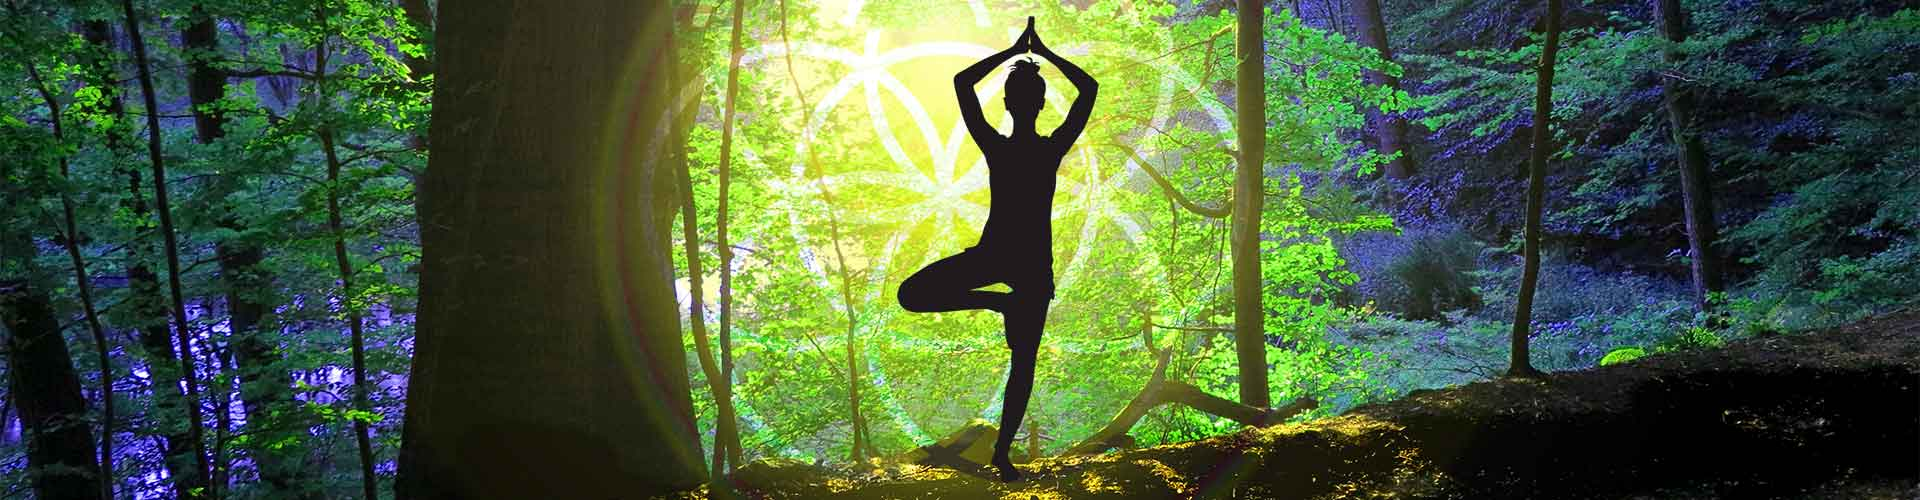 Vrikshasana (Baum) Asana auch als Fotoleinwand